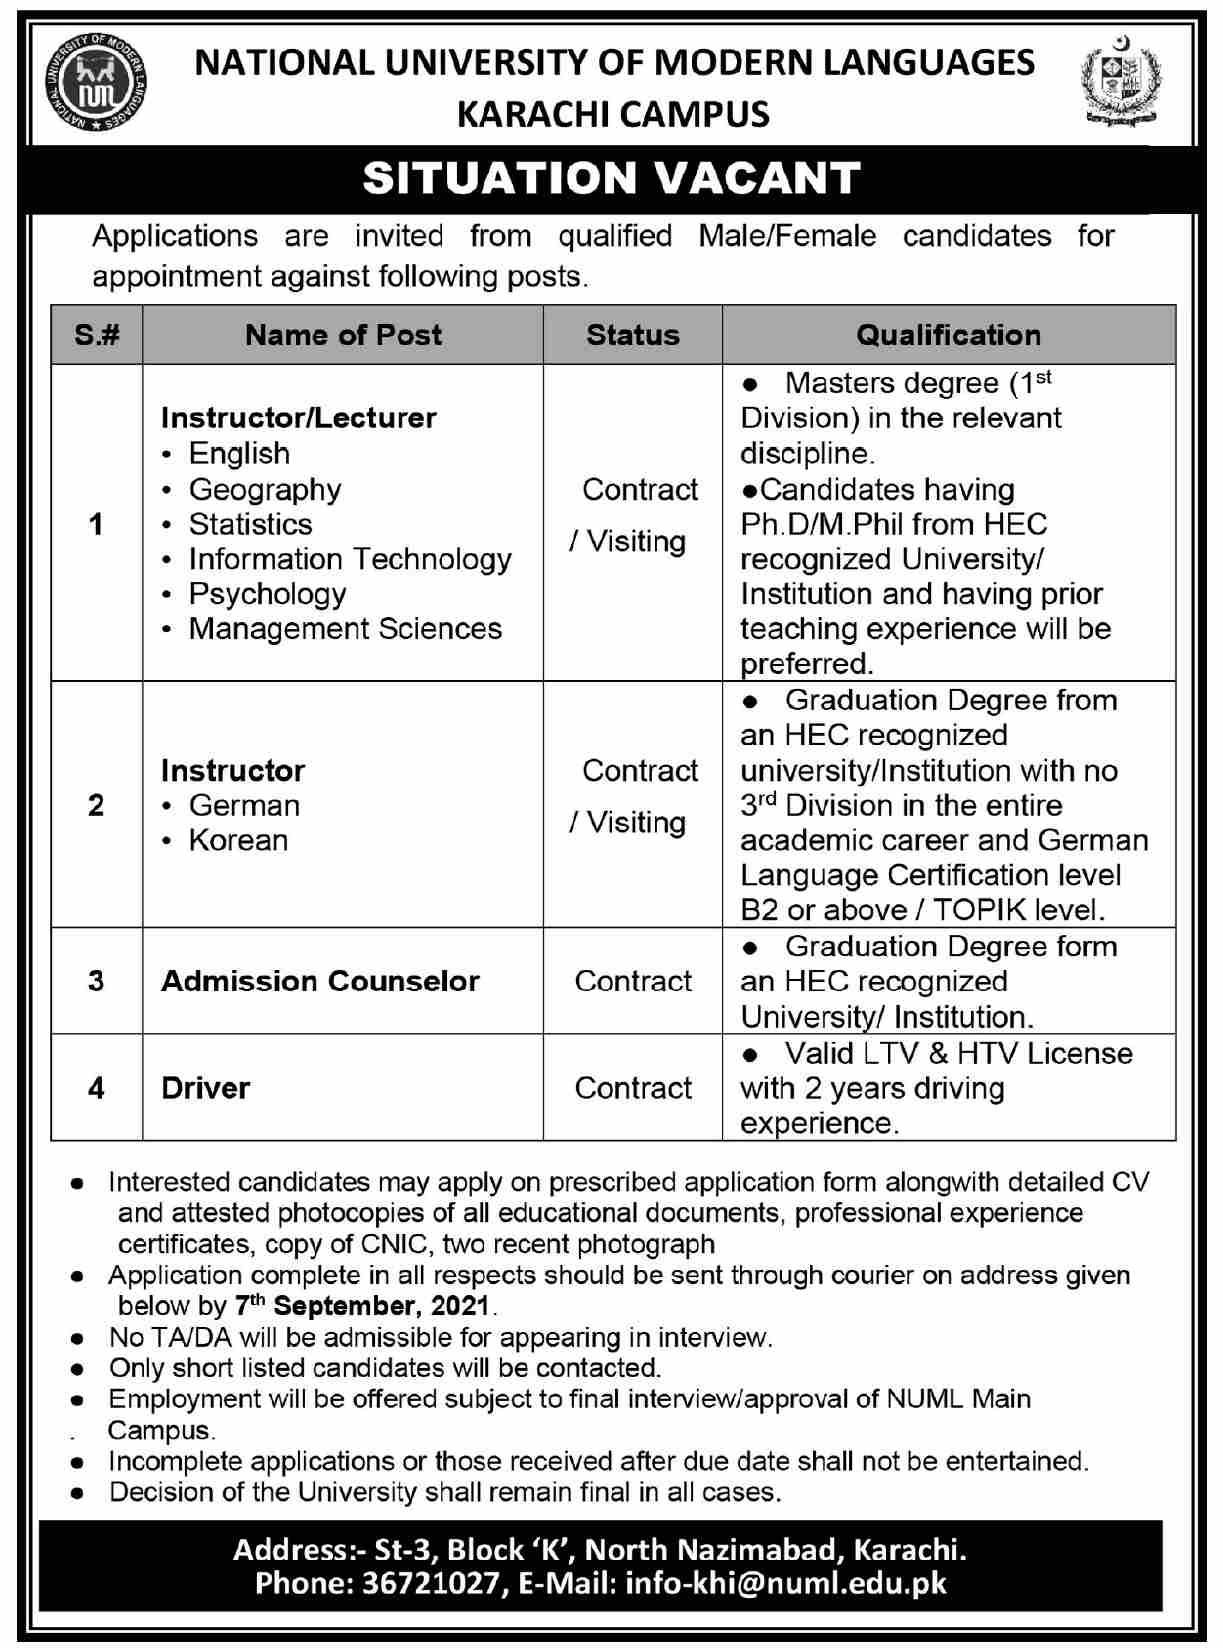 NUML University Jobs August 2021 Karachi Campus